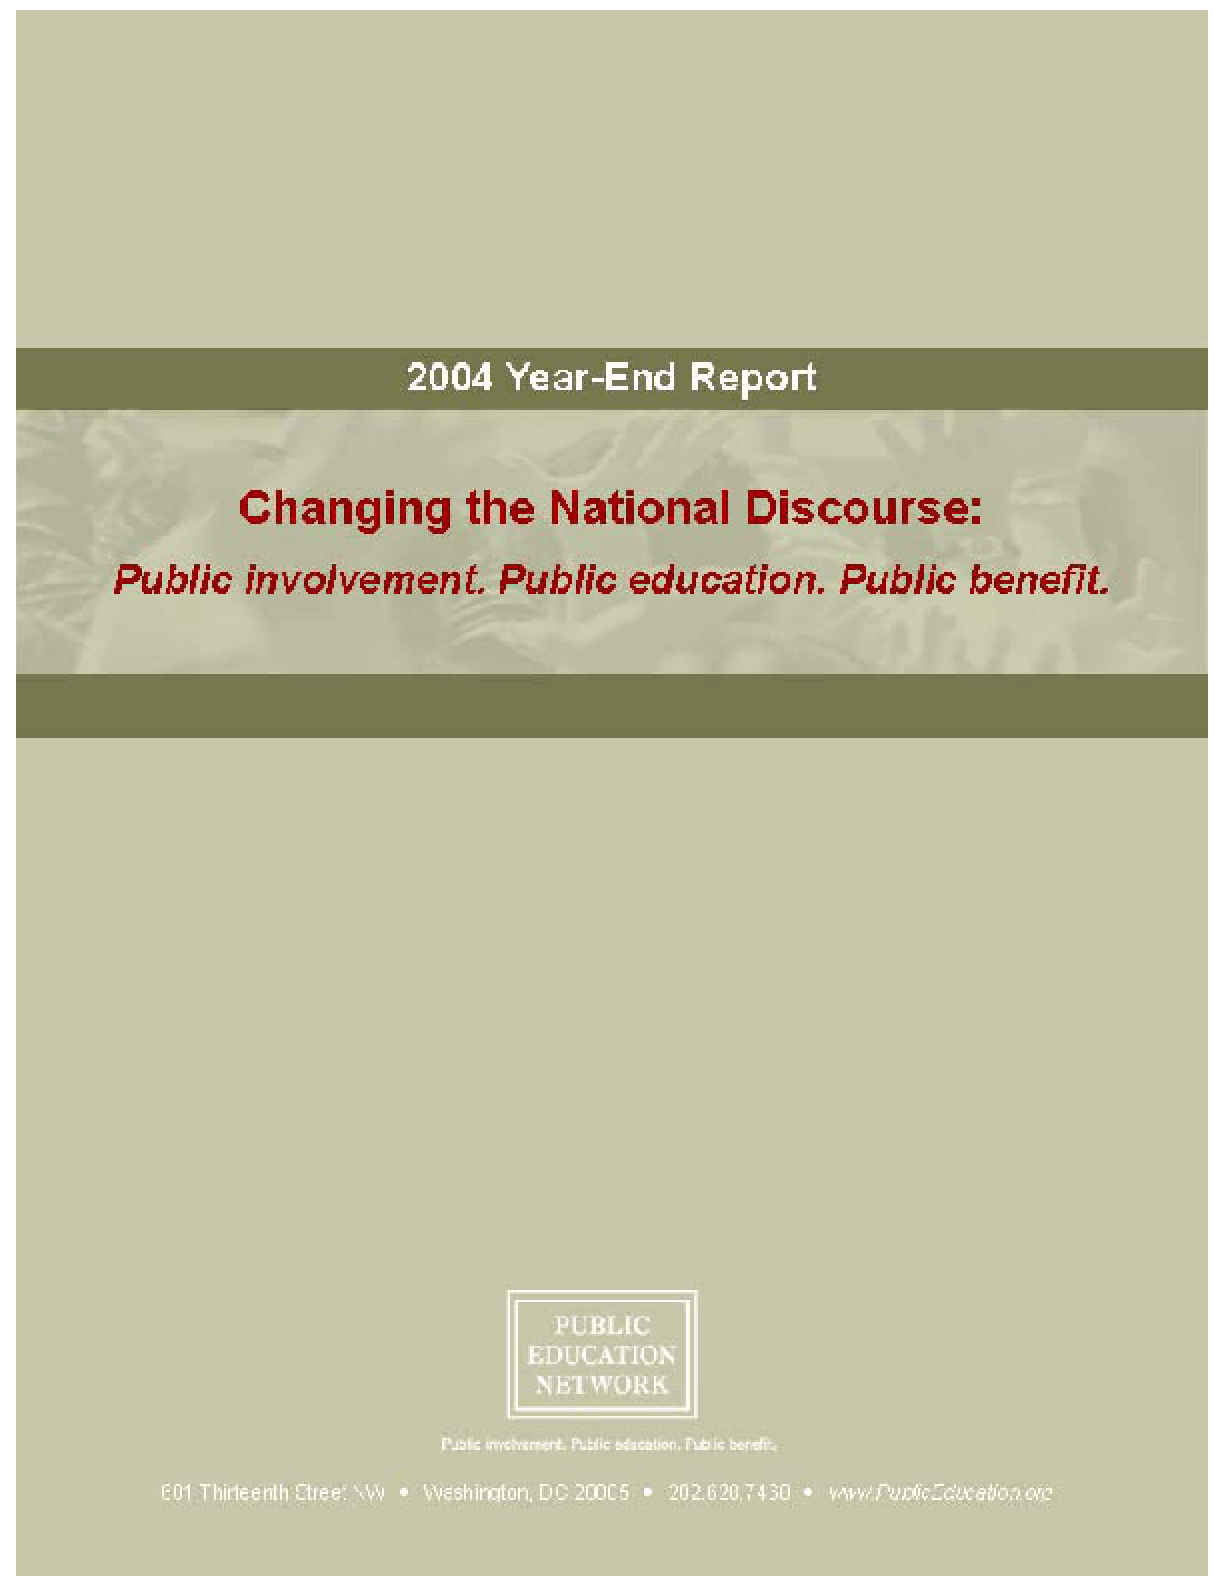 Public Education Network 2004 Annual Report - Changing the National Discourse: Public Involvement. Public Education. Public Benefit.